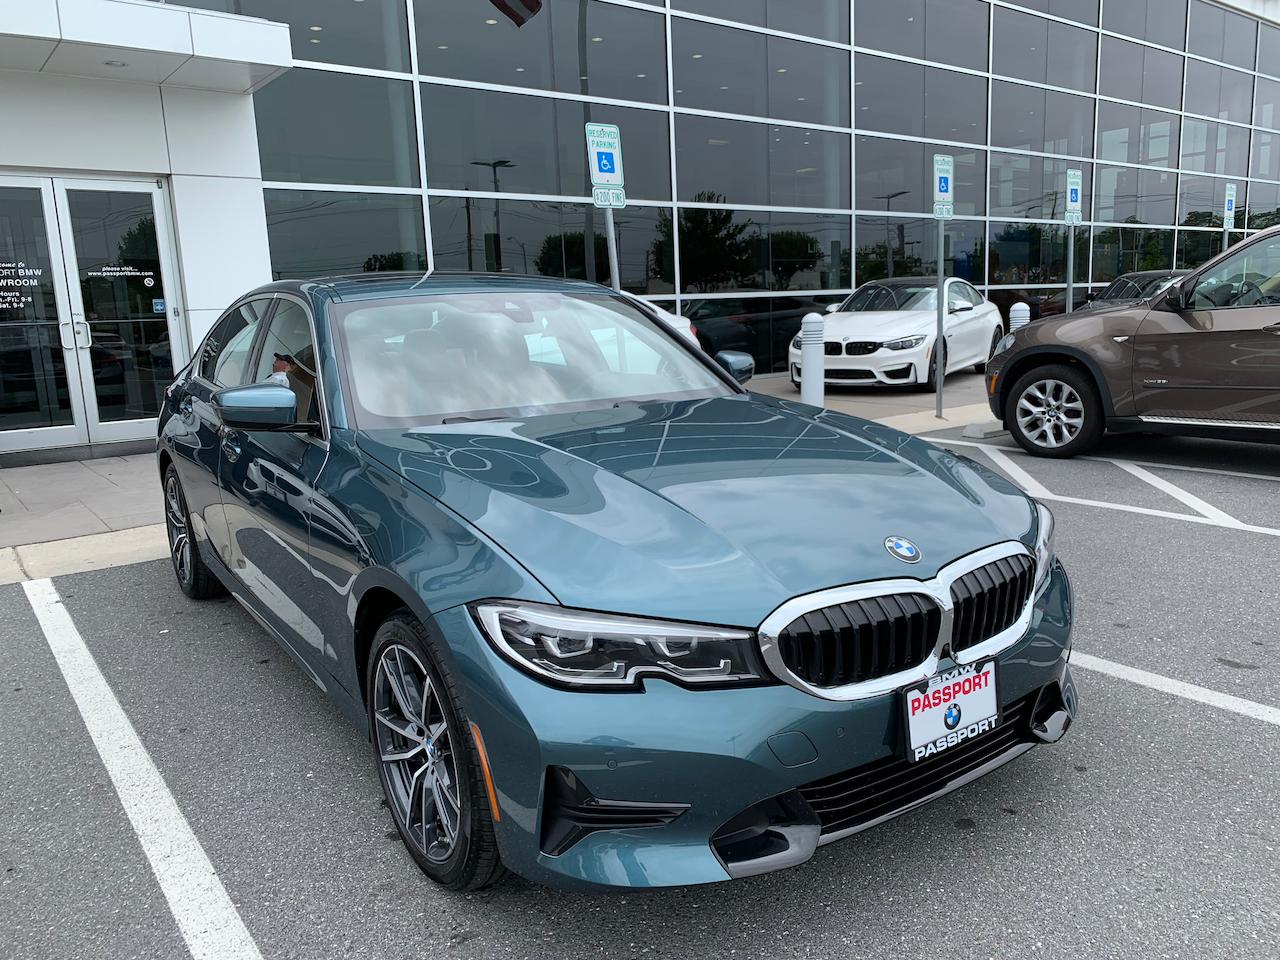 2018 - [BMW] Série 3 [G20/G21] - Page 32 2hf1860